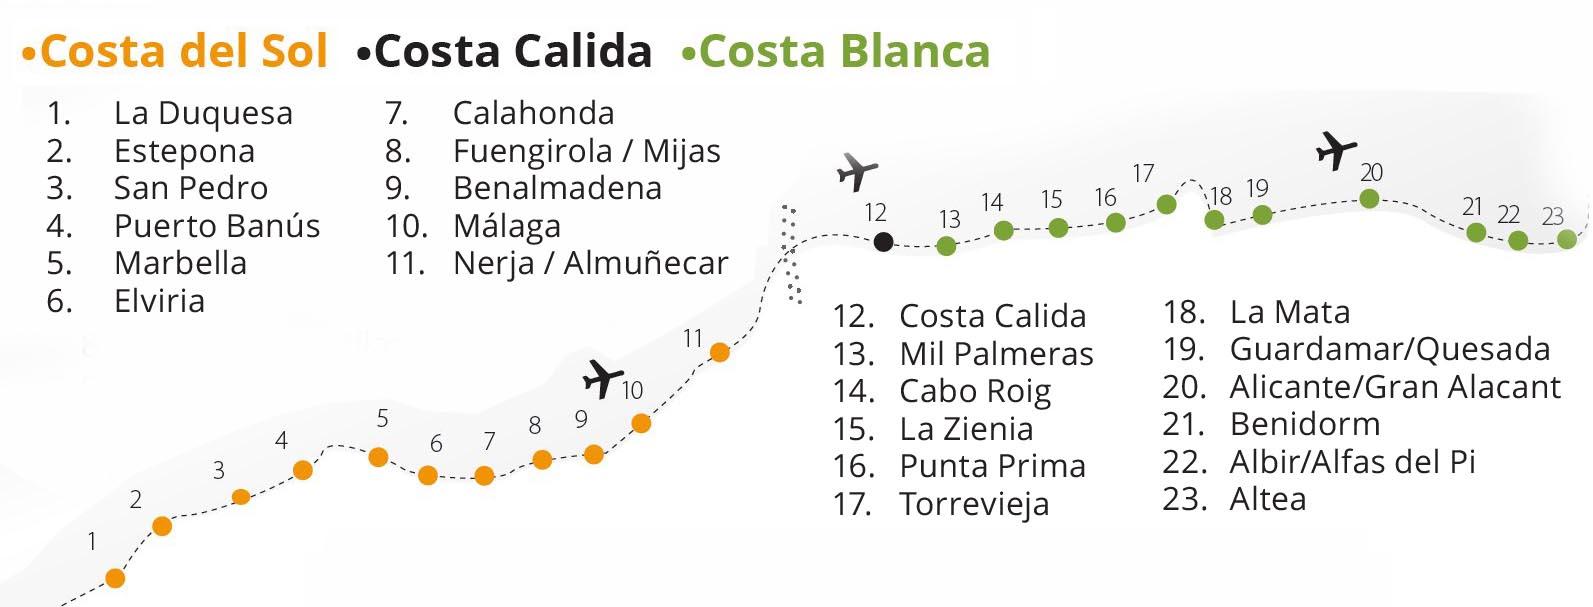 Områder som Estepona, Marbella, La Cala, Mil Palmeras, Cabo Roig og La Zenia